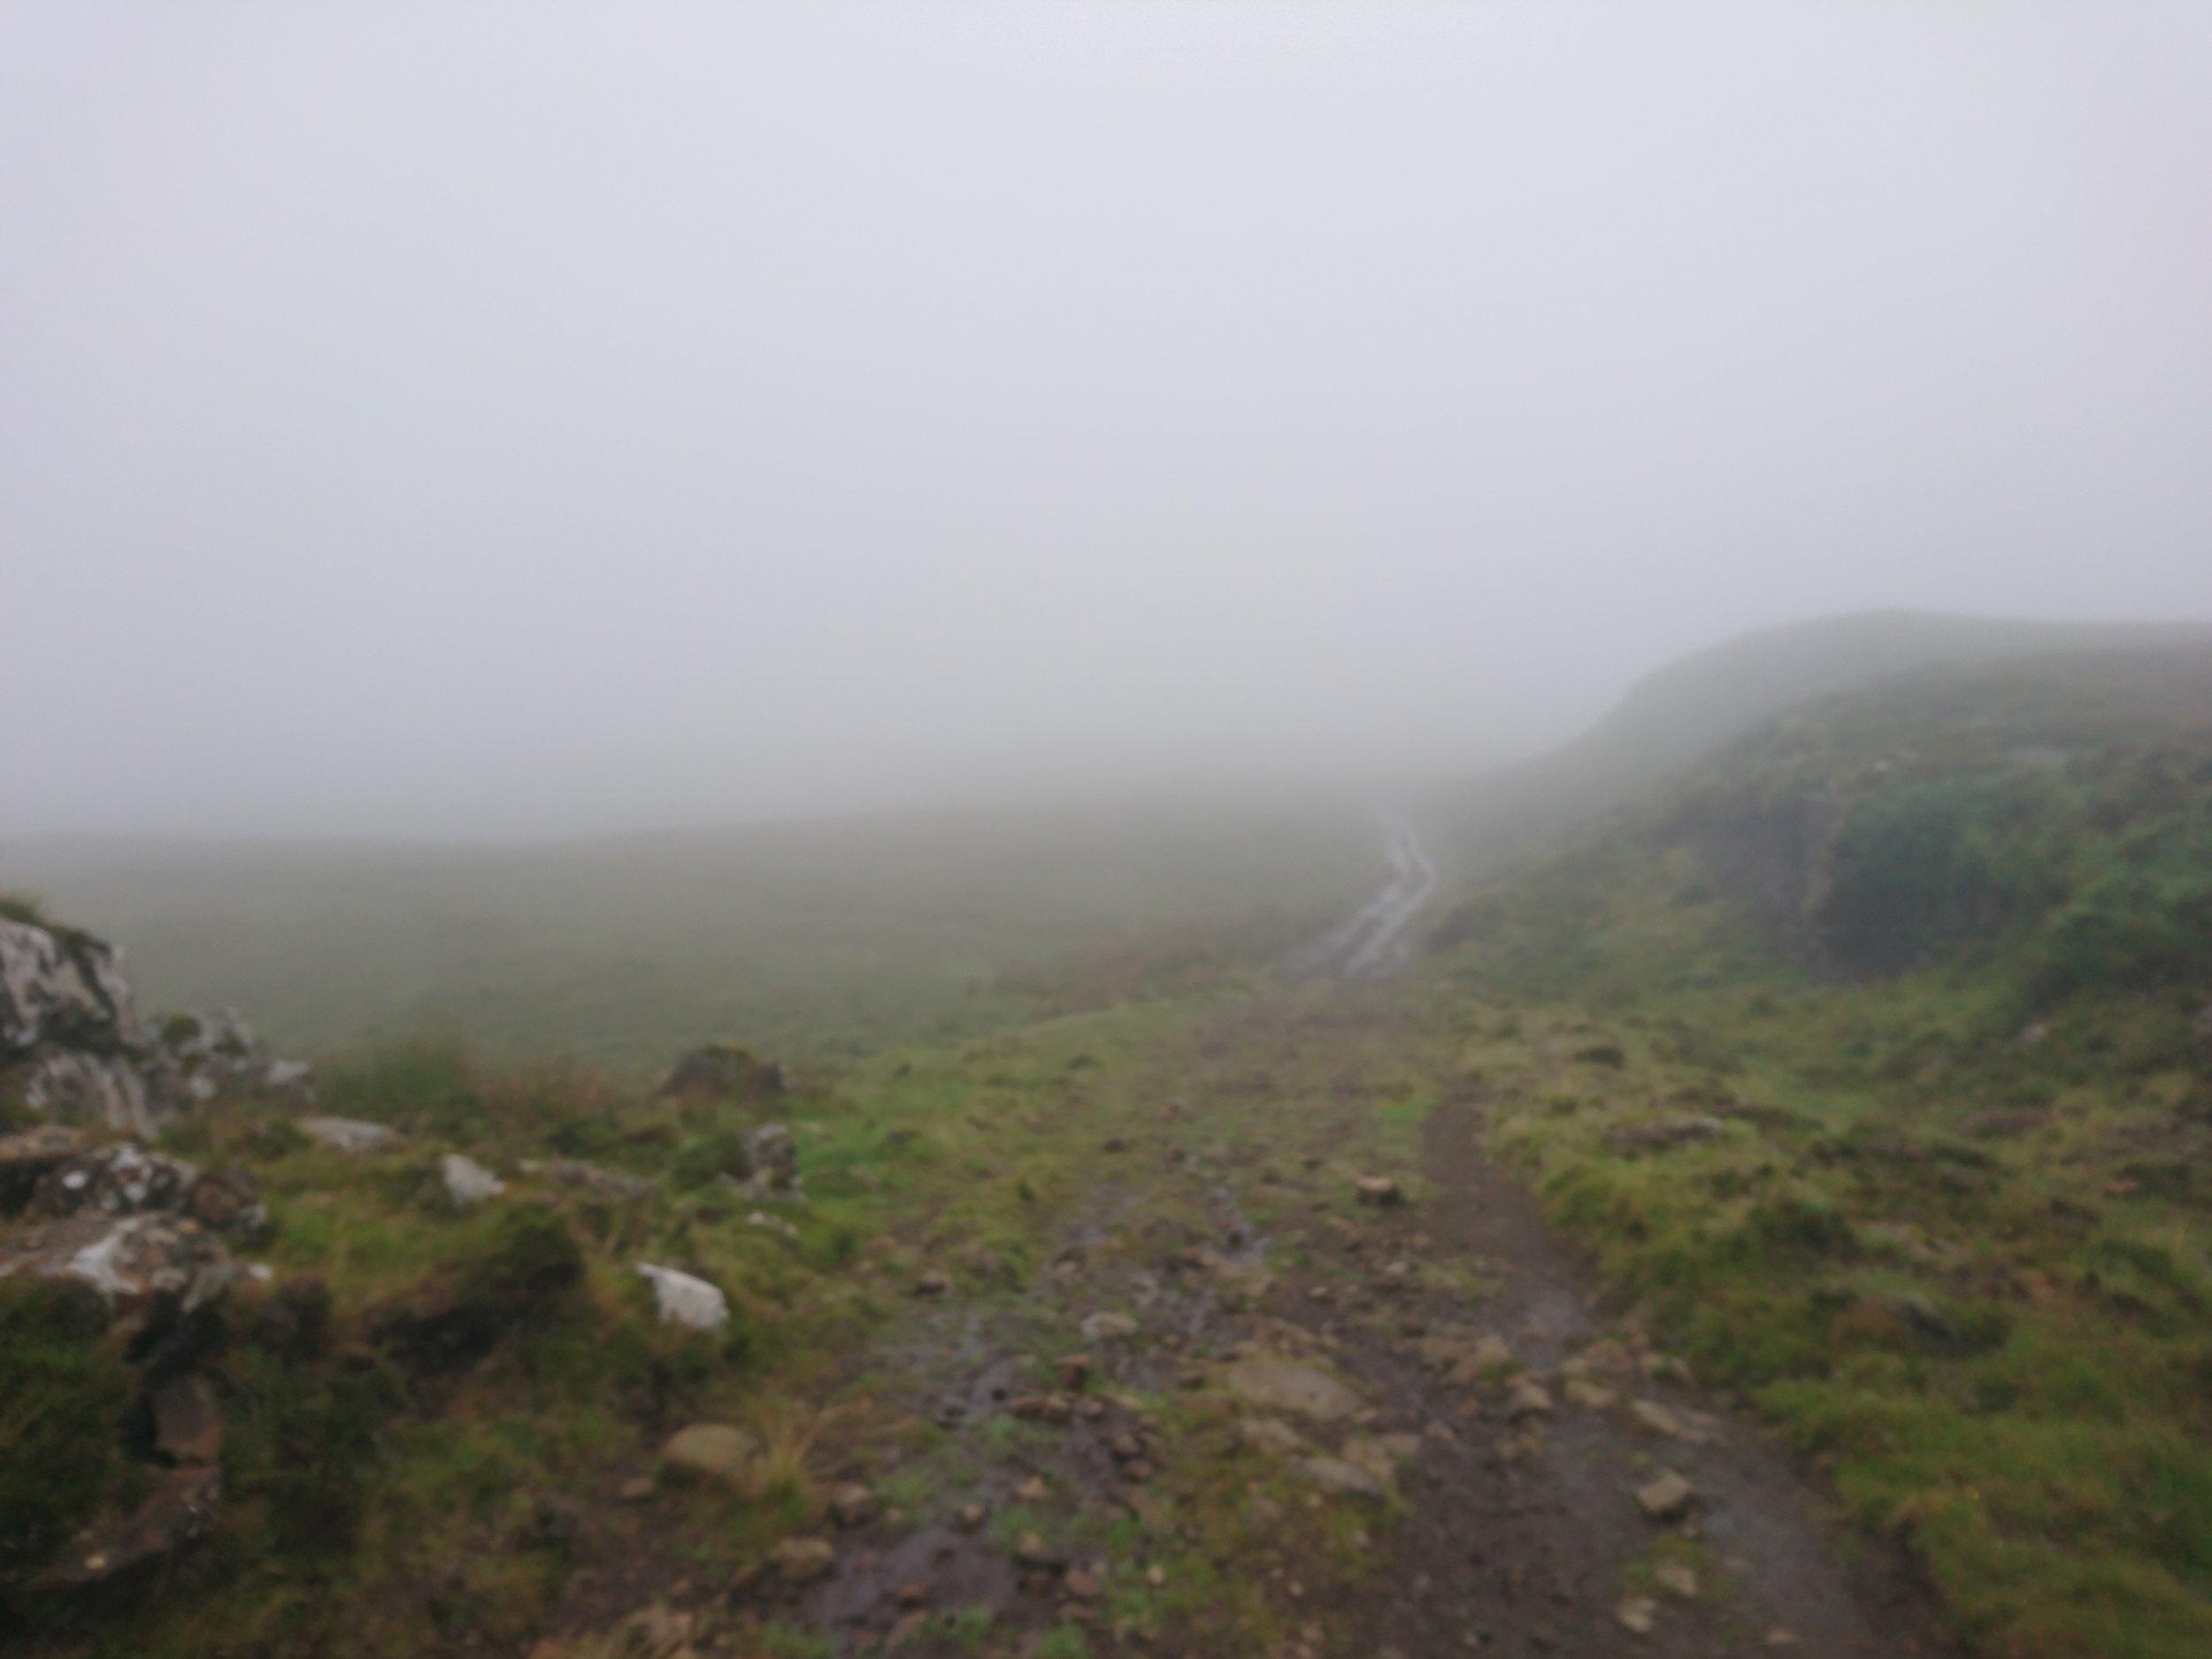 Gravel Track into the Fog